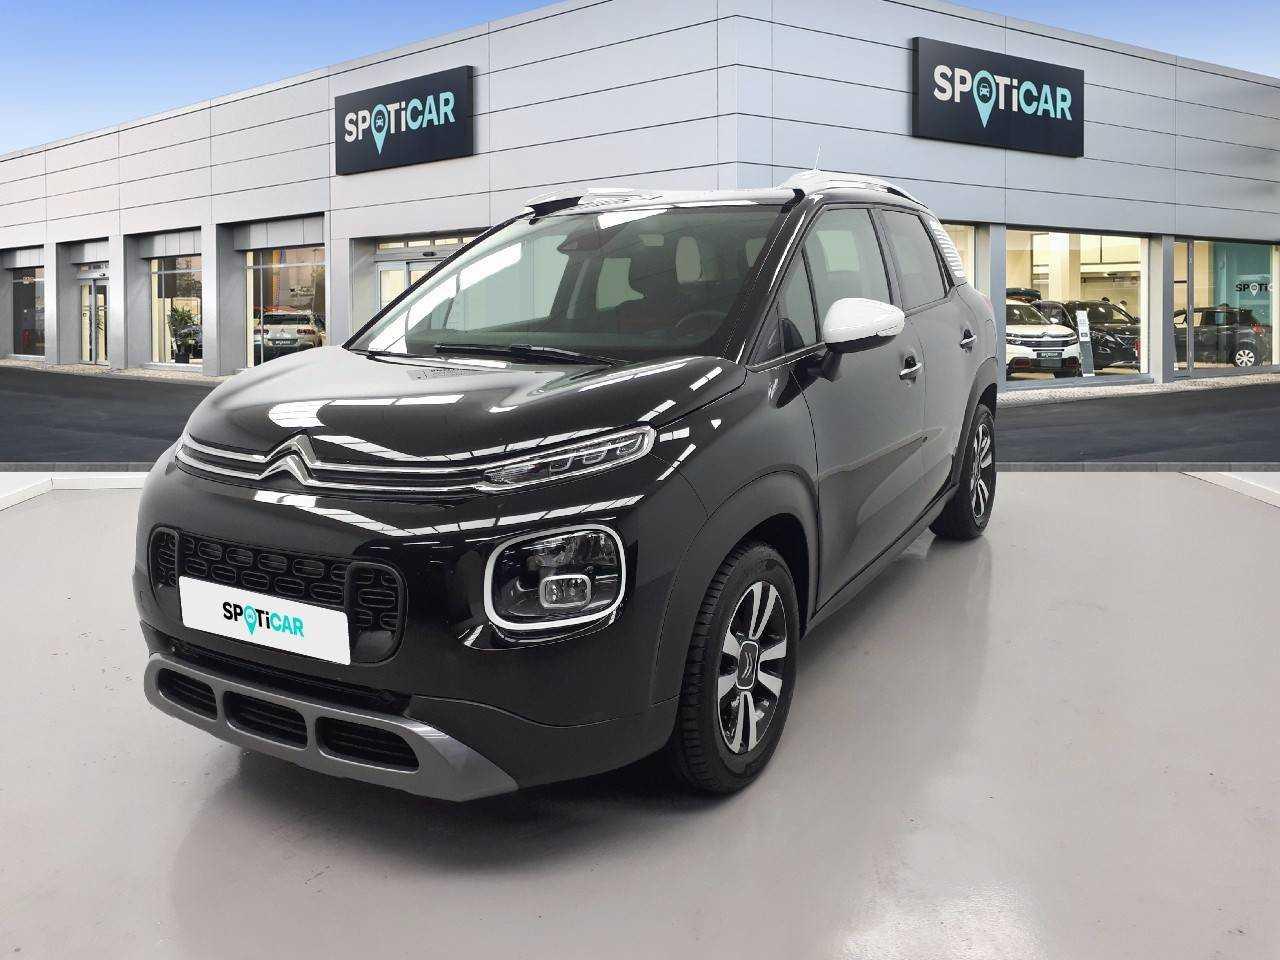 Citroën C3 Aircross ocasión segunda mano 2019 Diésel por 17.850€ en Madrid